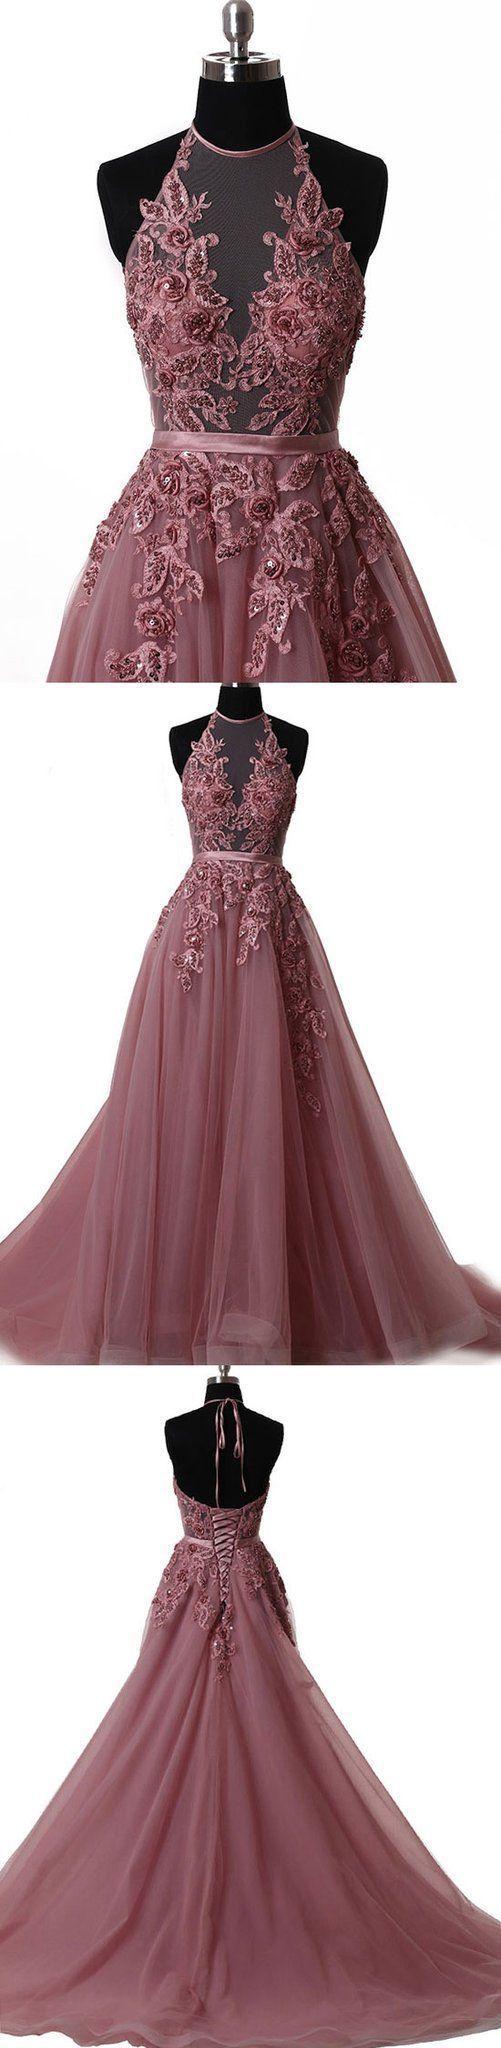 halter applique prom dress a-line tulle long evening dress,HS125  #moddress #promdresses #fashion #shopping #dresses #eveningdresses